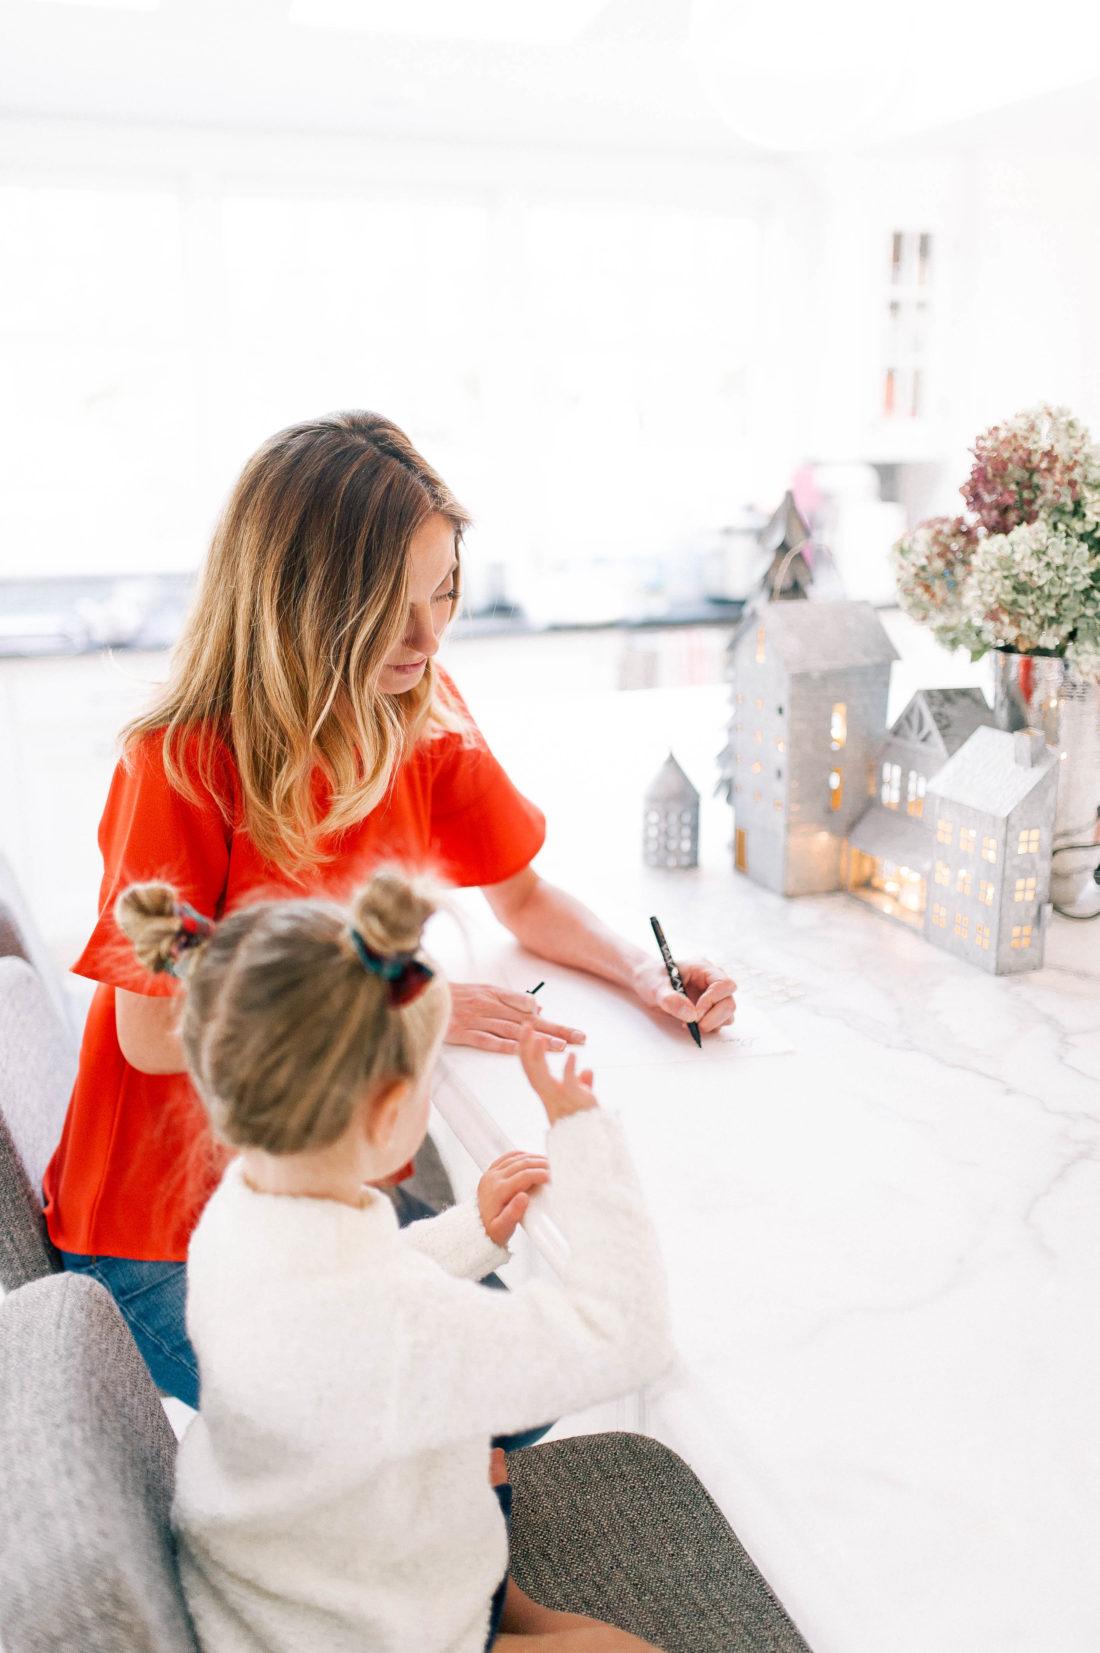 Eva Amurri Martino helps three year old daughter Marlowe write a letter to Santa